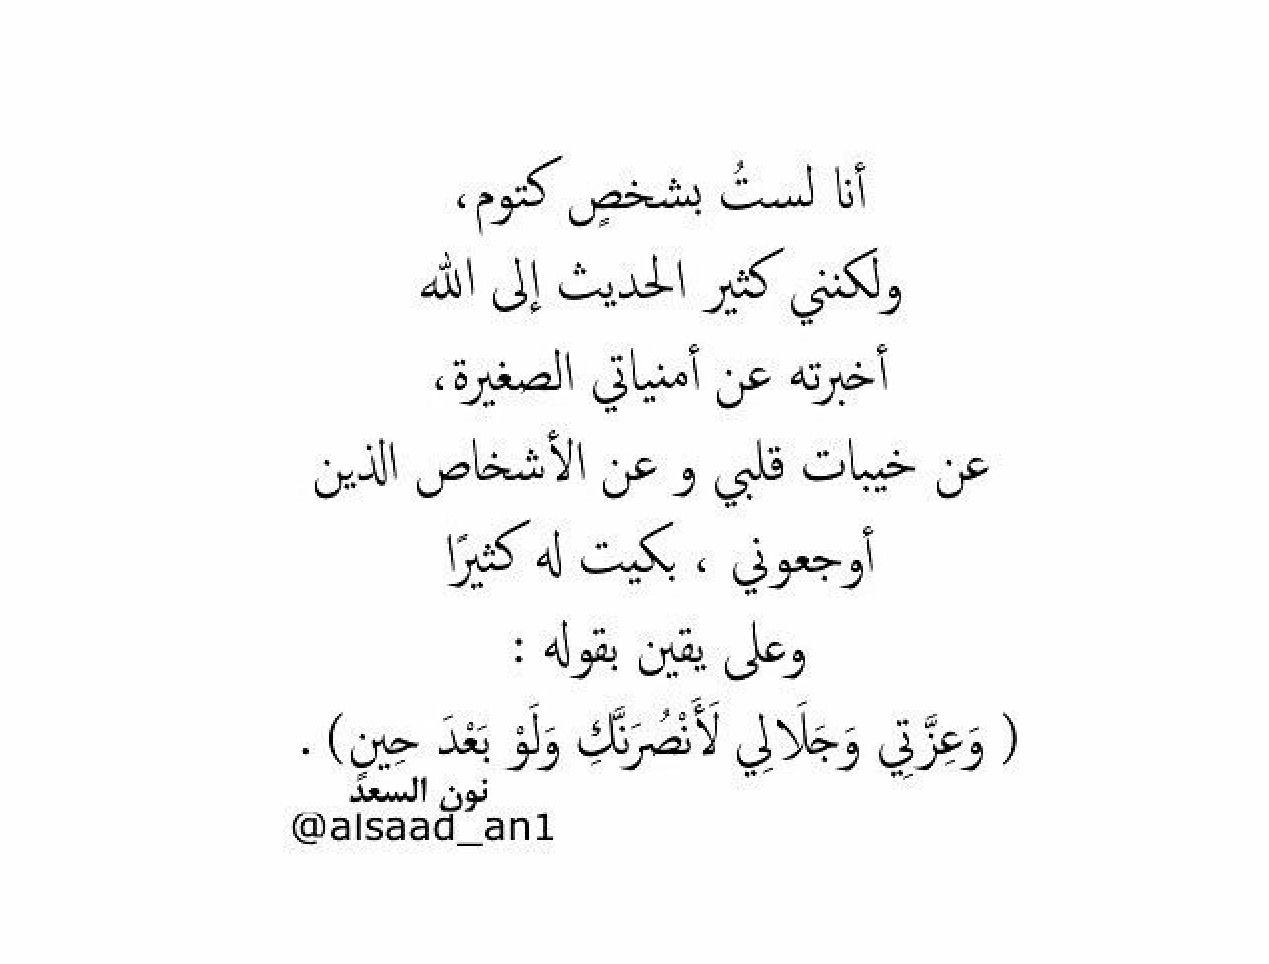 Pin By Shada Trabieh On للحياة مع الله م ذاق آخر Math Ill Math Equations